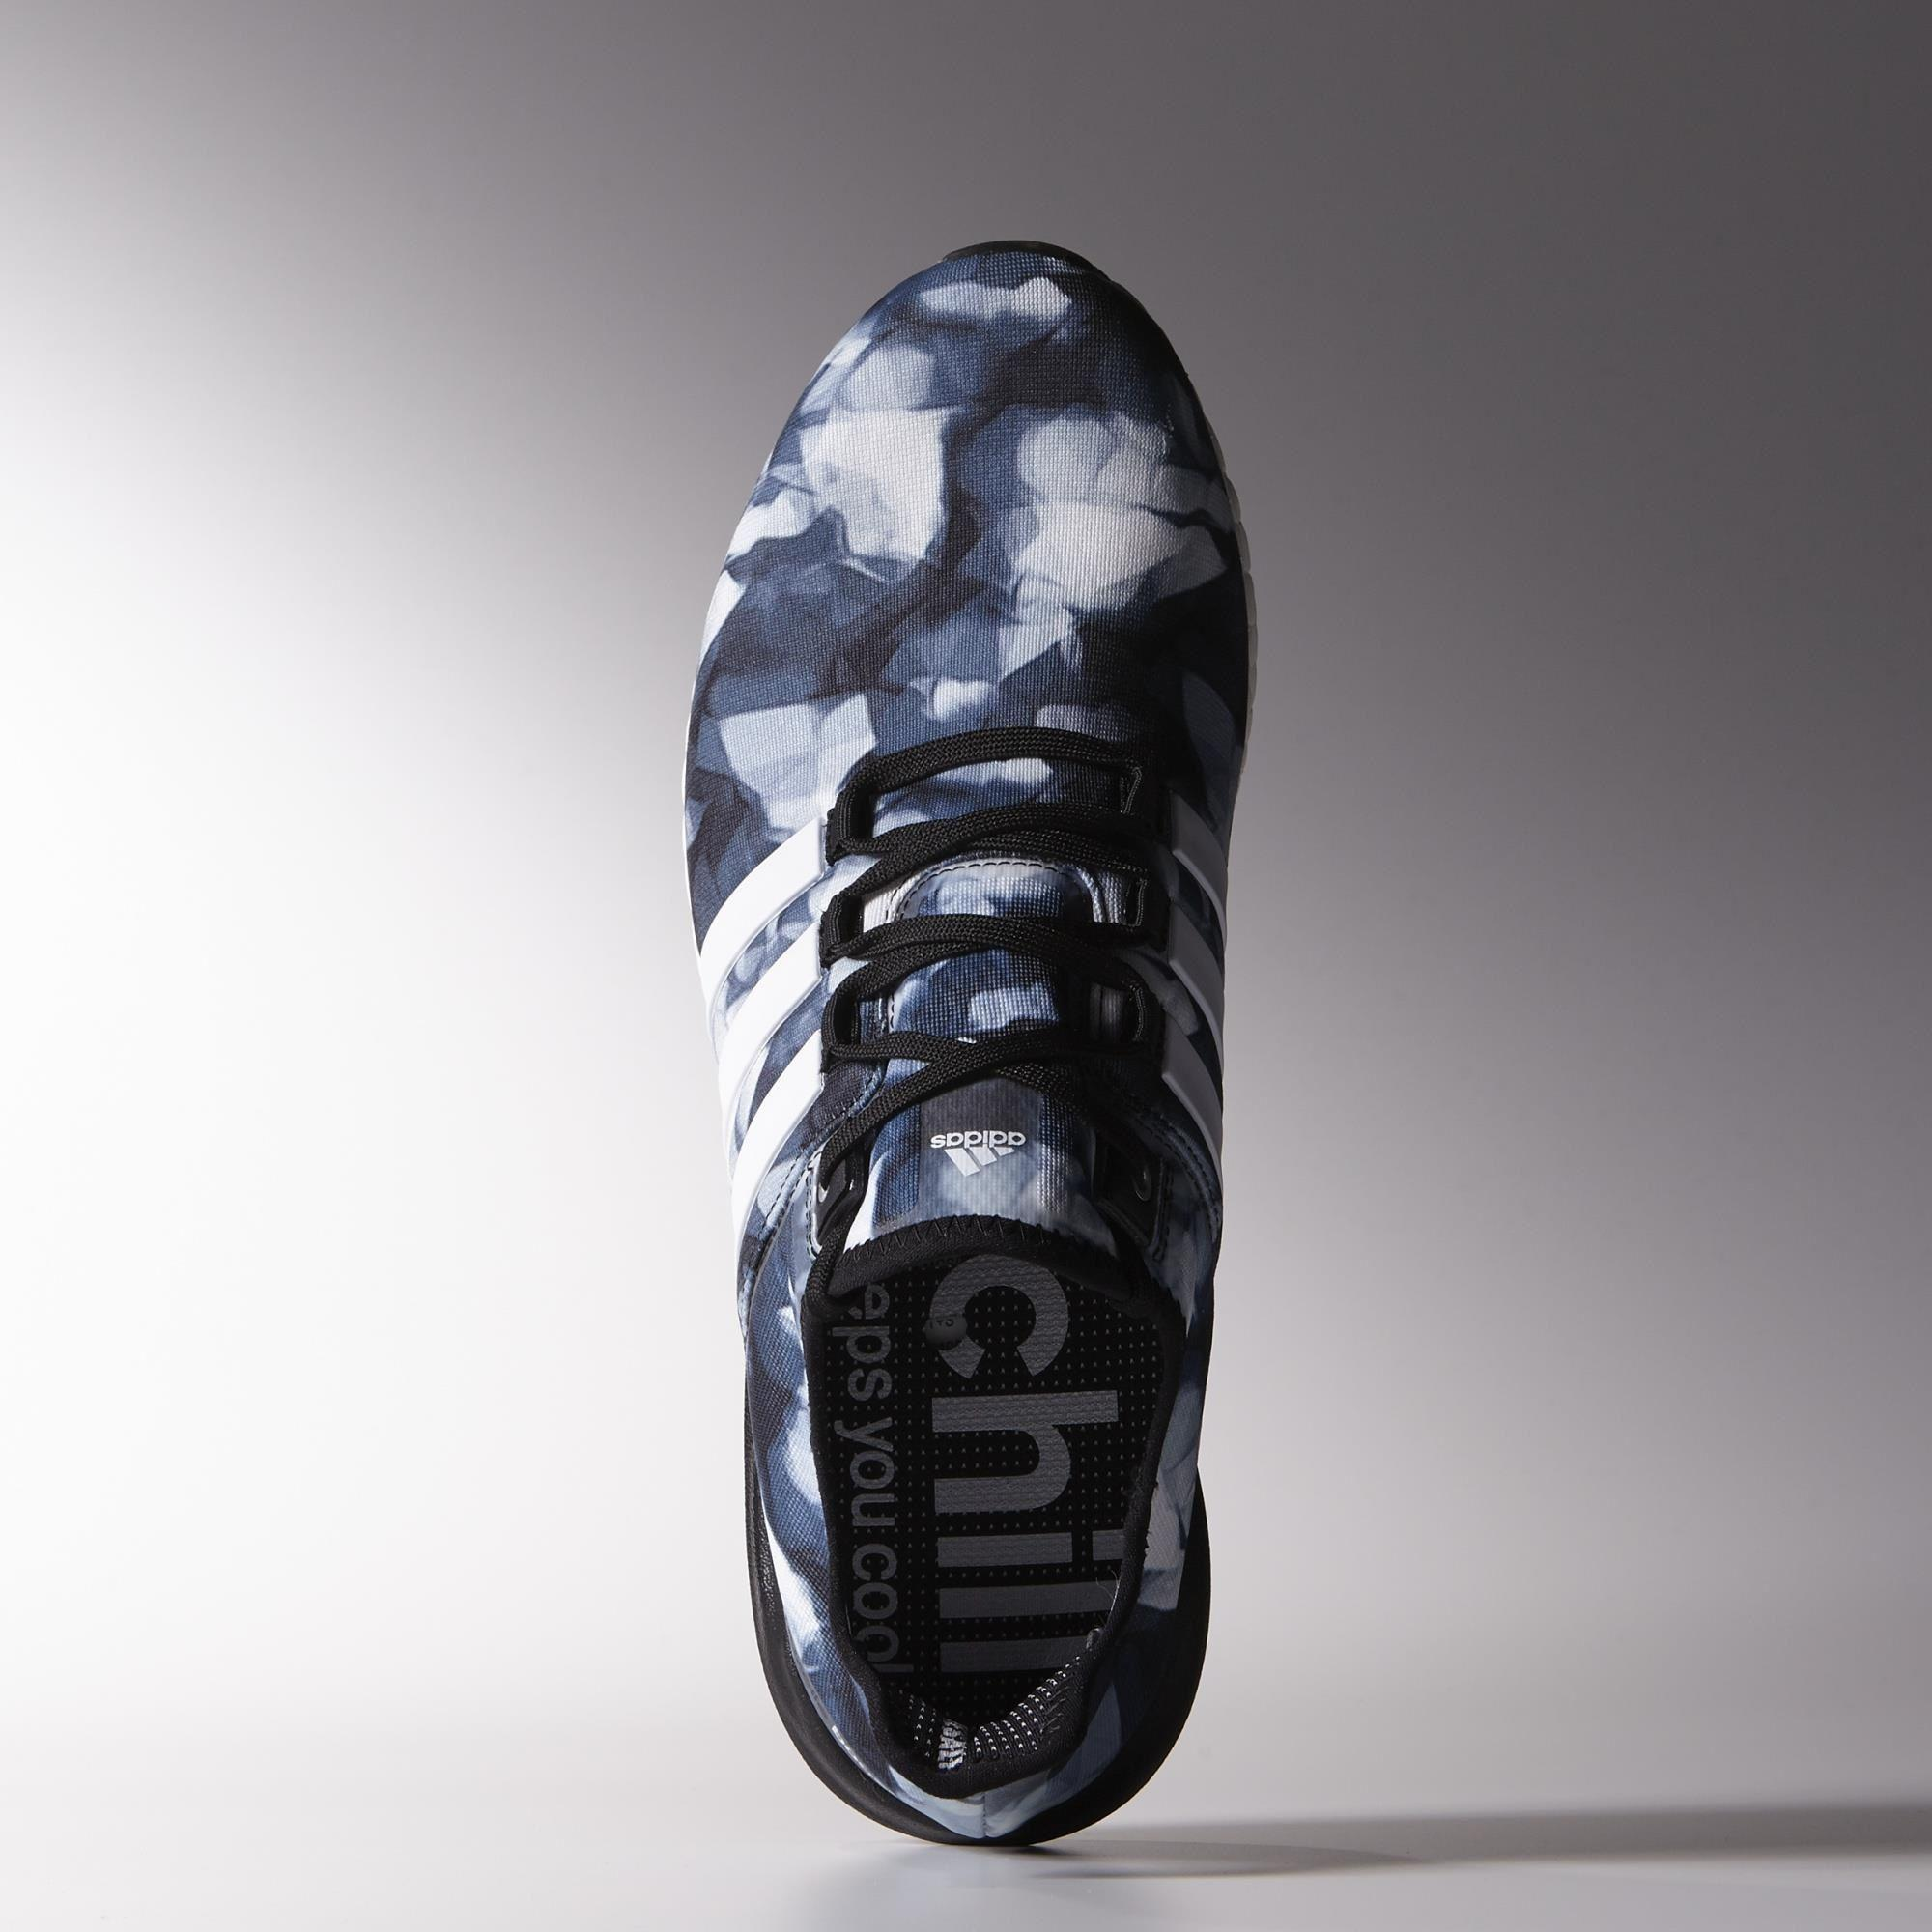 wholesale dealer fdd8b 88061 Adidas Mens Climachill Gazelle Boost Running Shoes - Black White